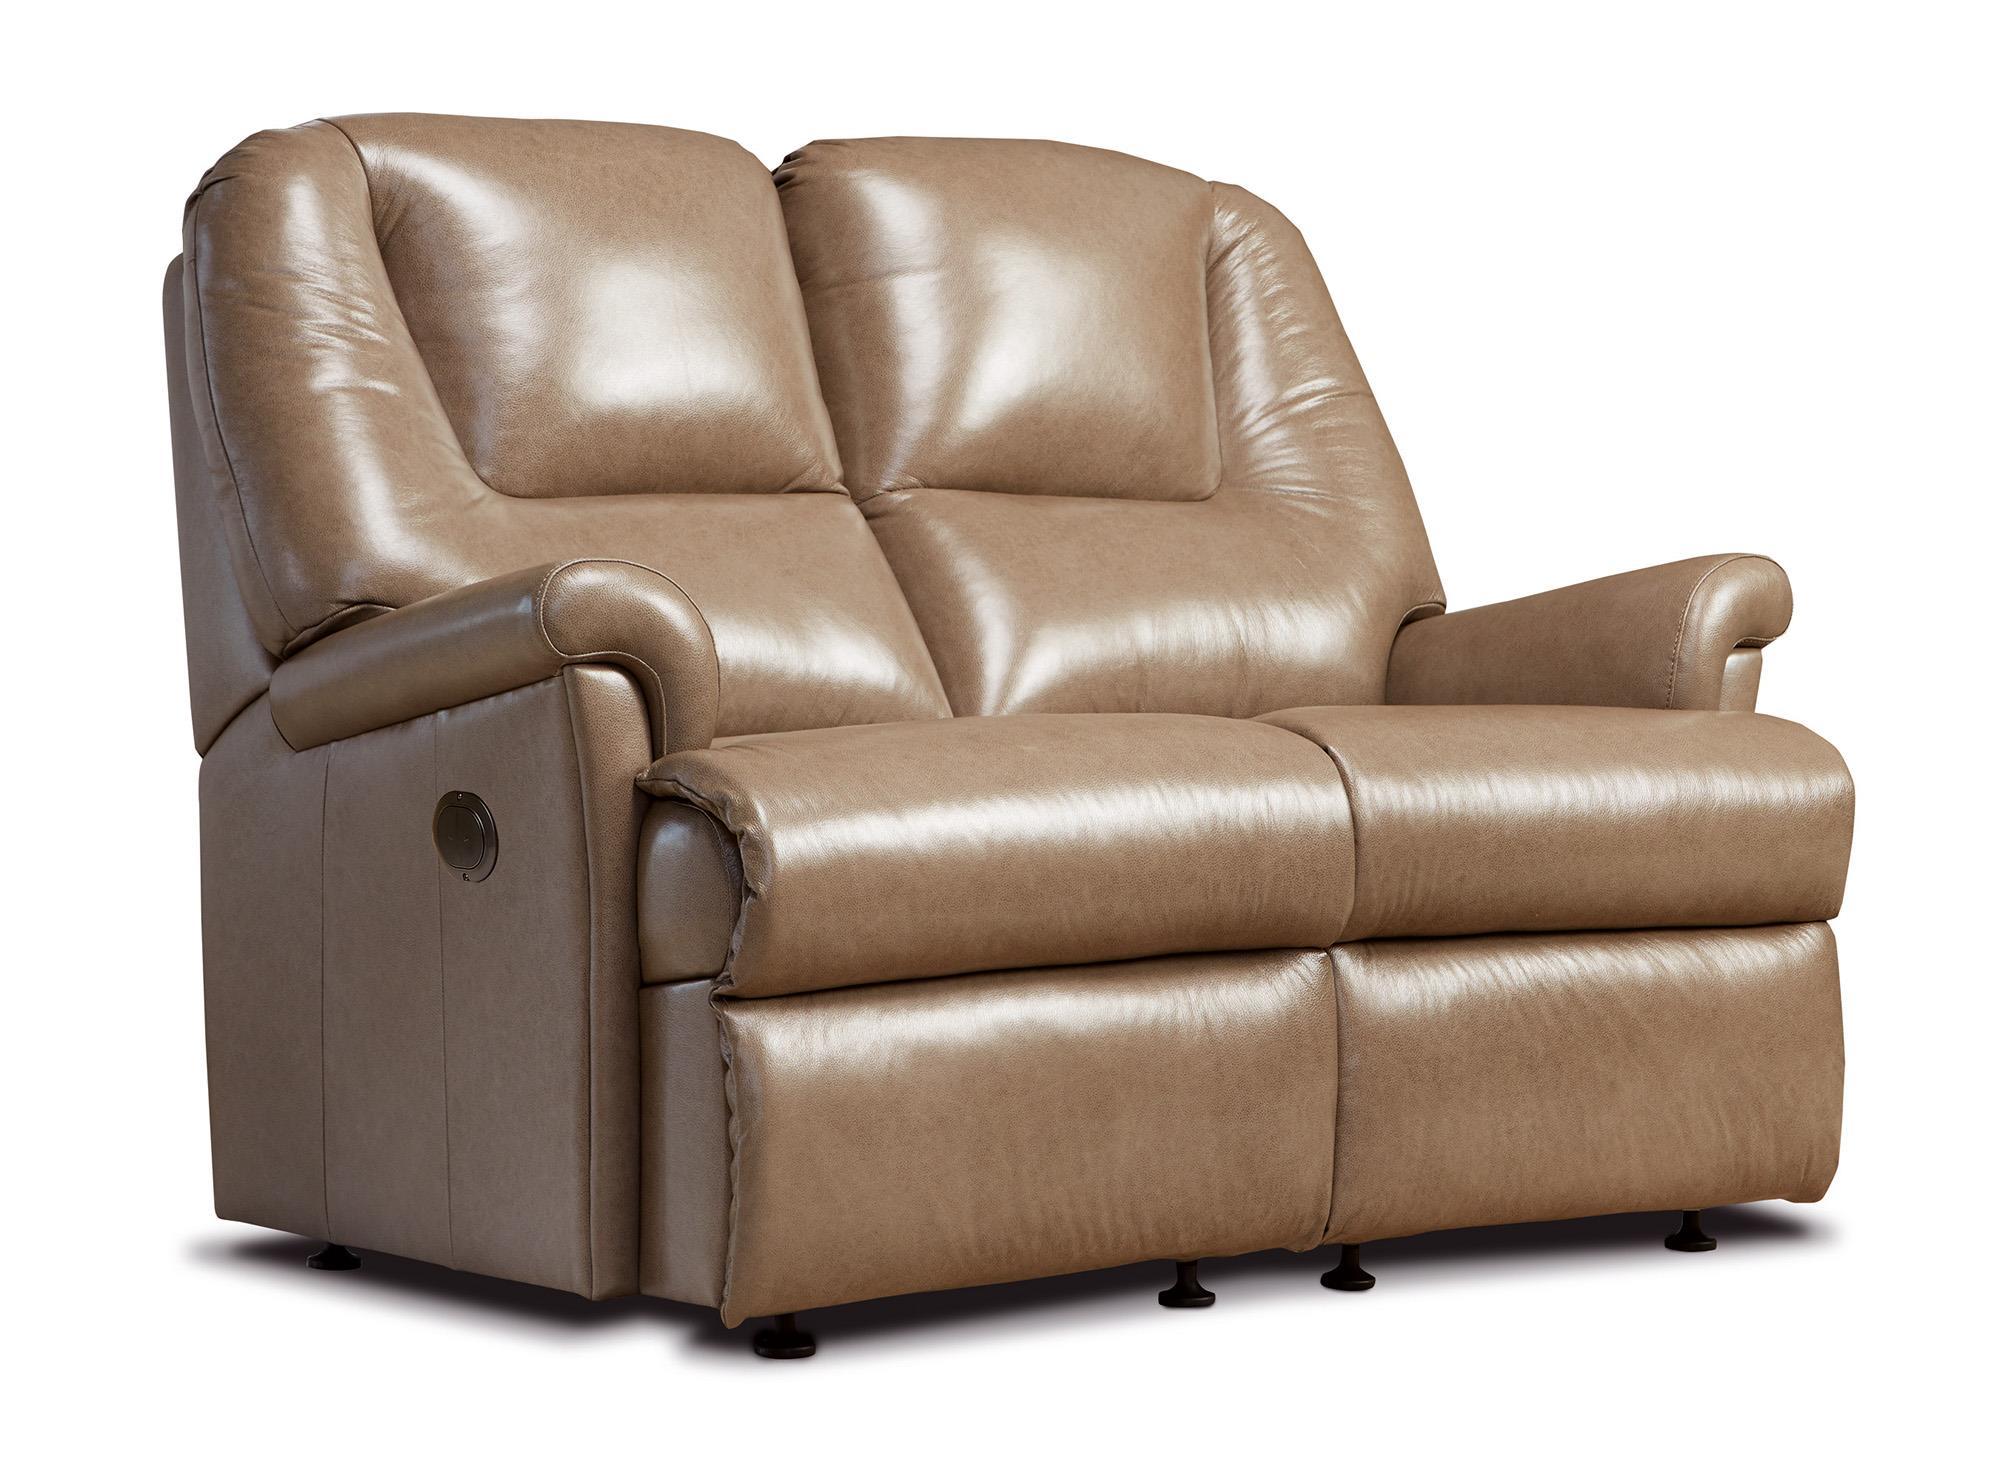 MILBURN - 2 Seater Settee